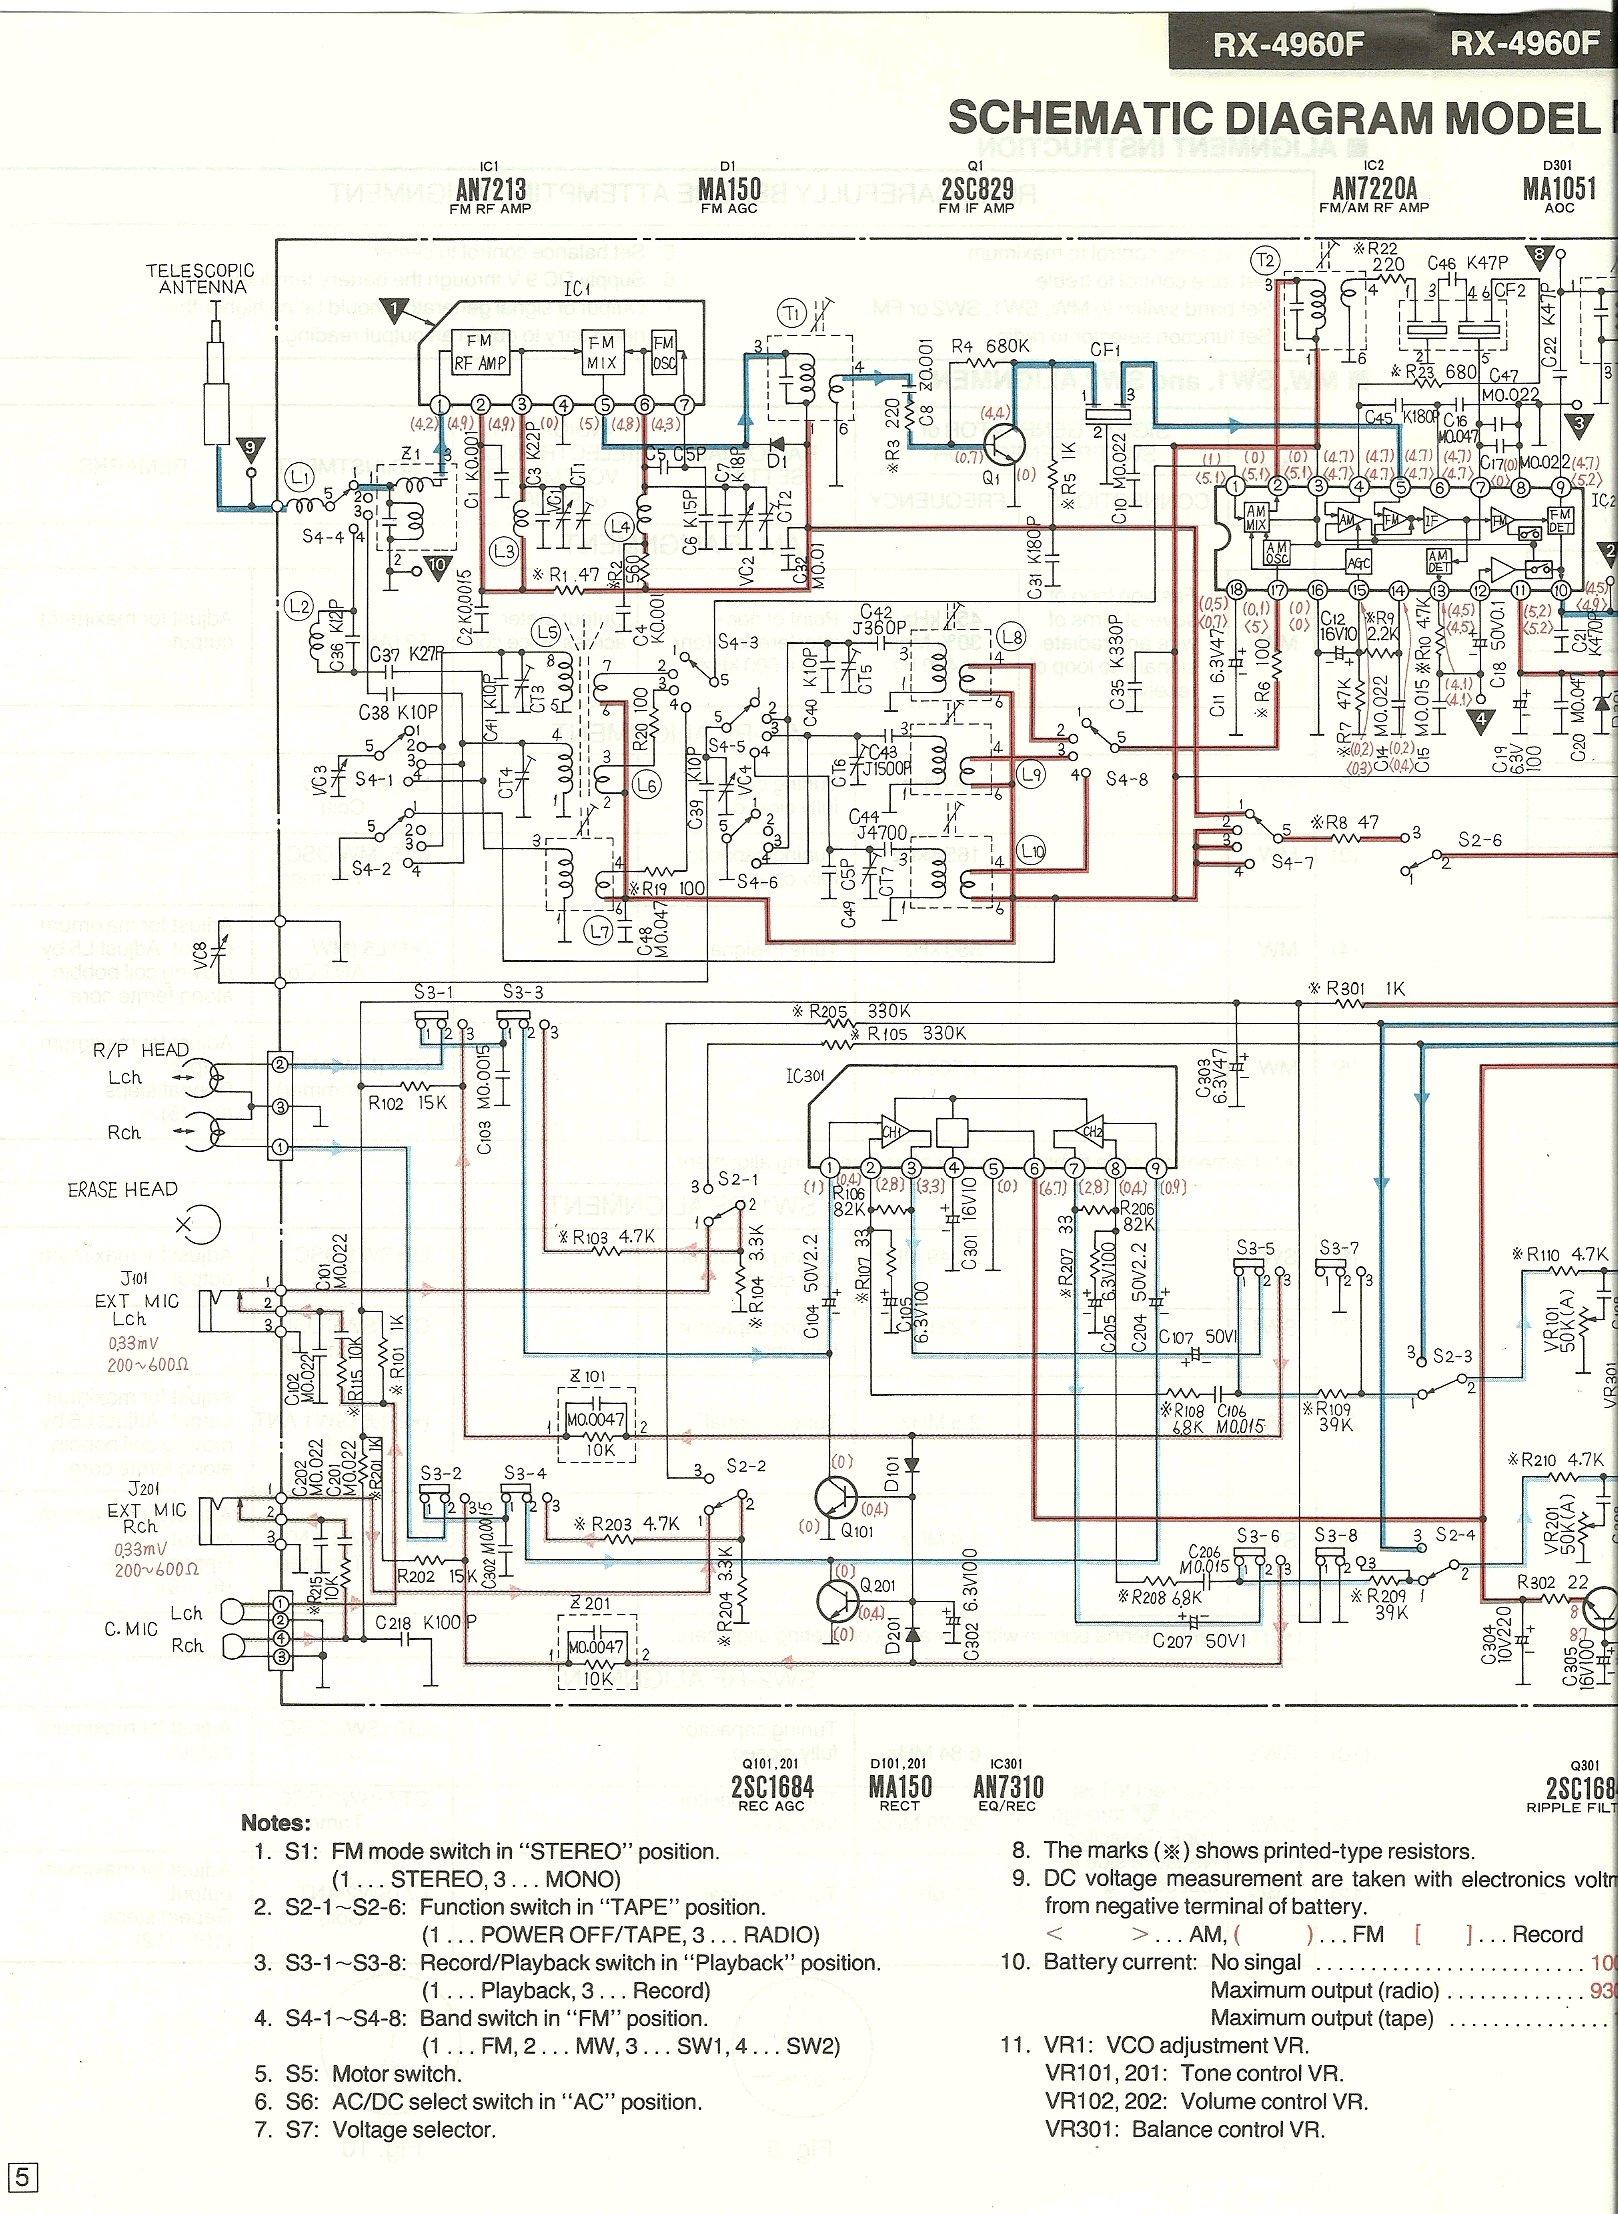 Sanyo Tv Wiring Diagram - Ford F150 Xlt Fuse Box -  piooner-radios.tukune.jeanjaures37.fr | Sanyo Tv 46840 Wiring Diagram |  | Wiring Diagram Resource